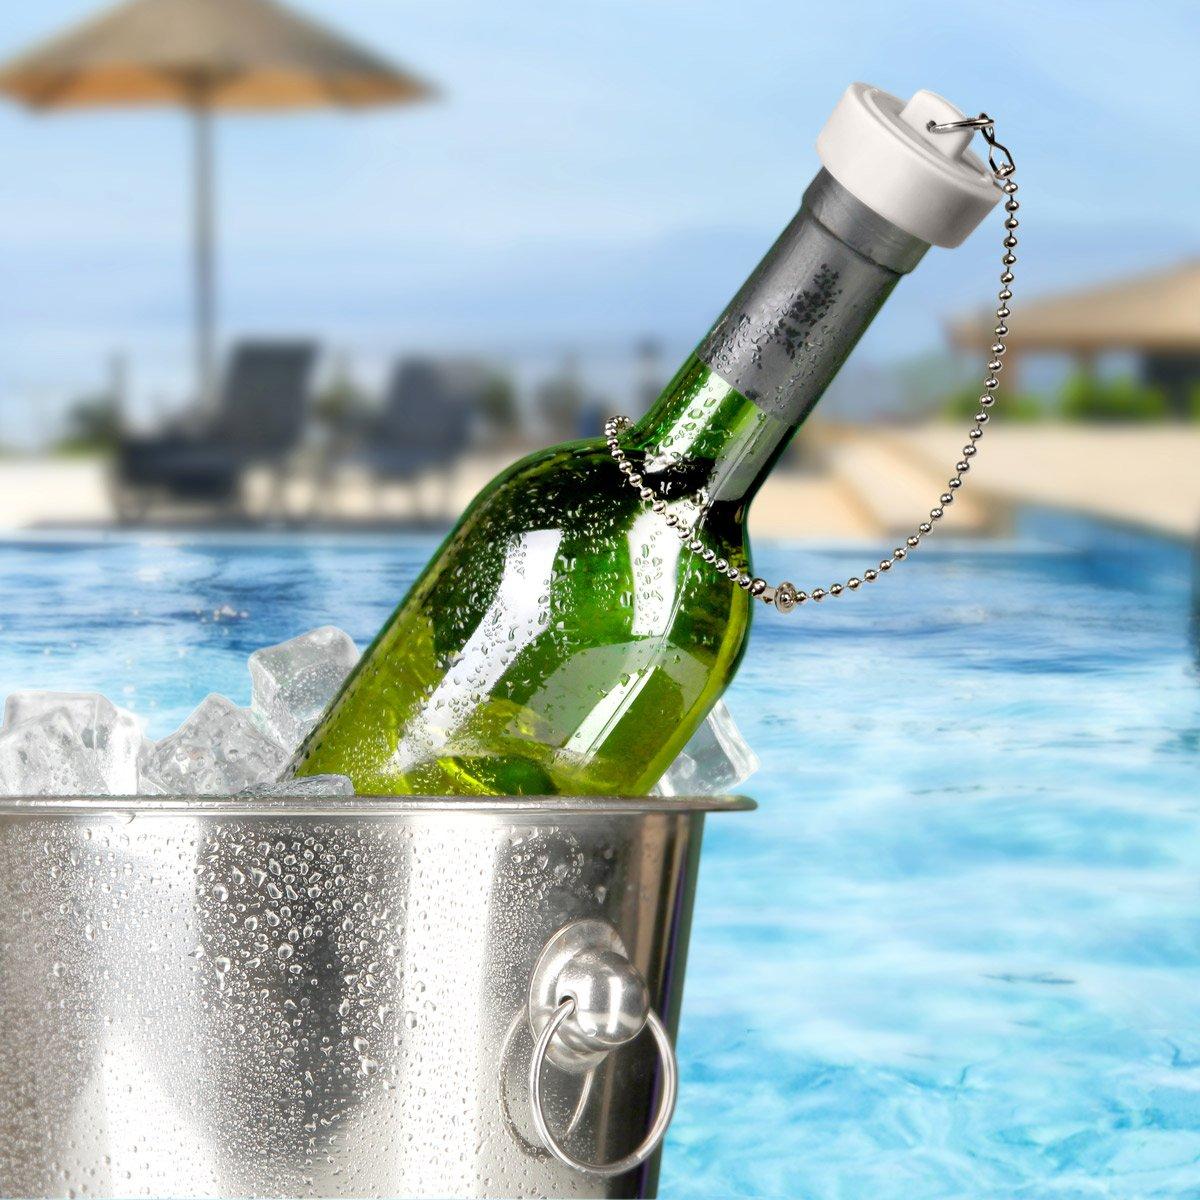 Bathtub Drain Plug Wine Bottle Stopper - The Green Head